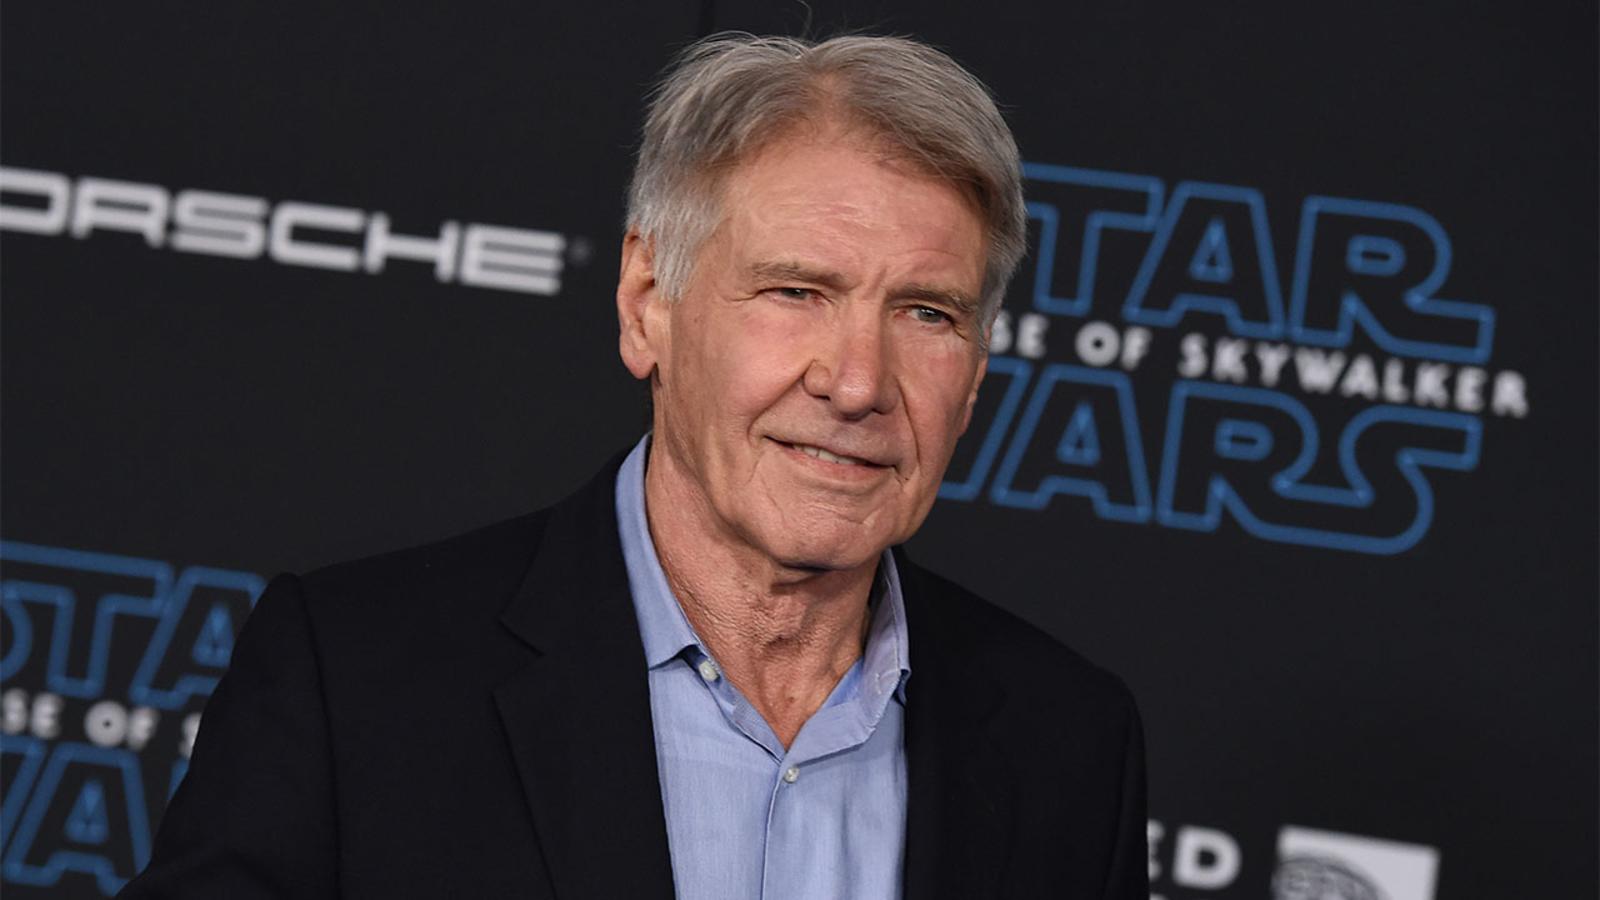 Harrison Ford Talks Han Solo S Death Star Wars Rise Of Skywalker Appearance On Jimmy Kimmel Live Abc7 San Francisco